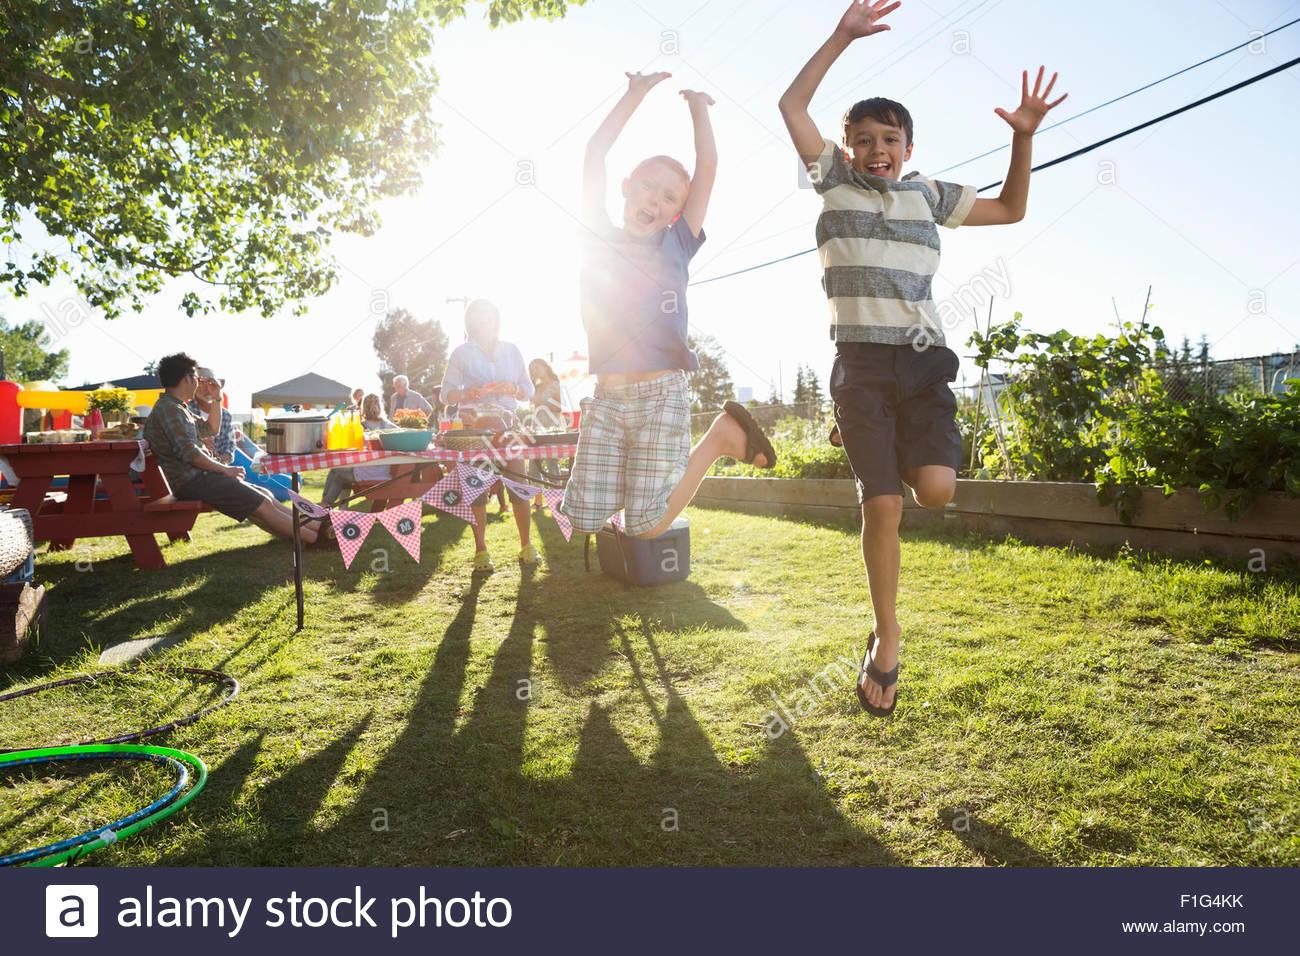 Portrait playful boys jumping for joy sunny park - Stock Image